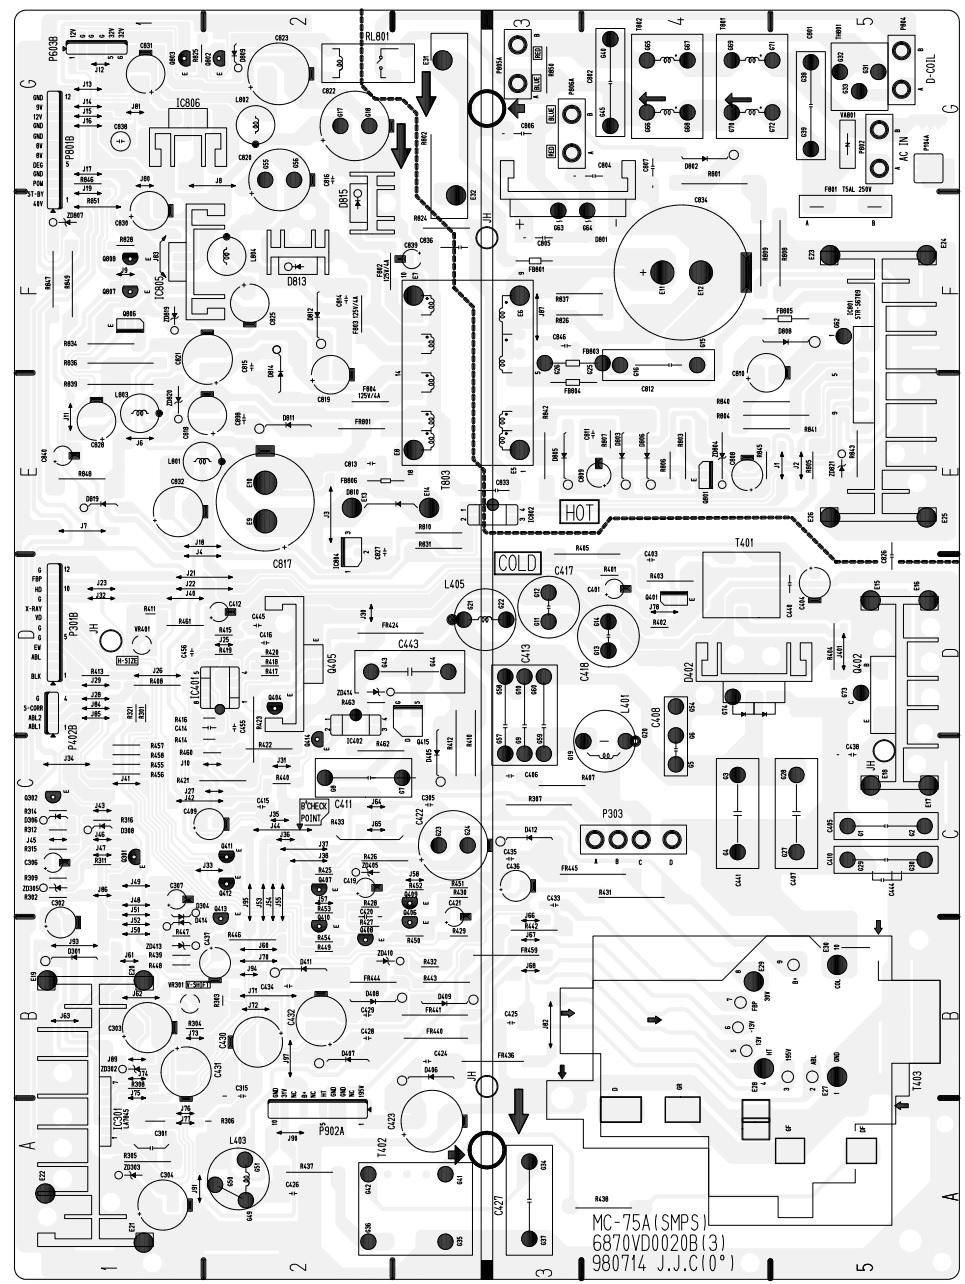 lg crt diagram